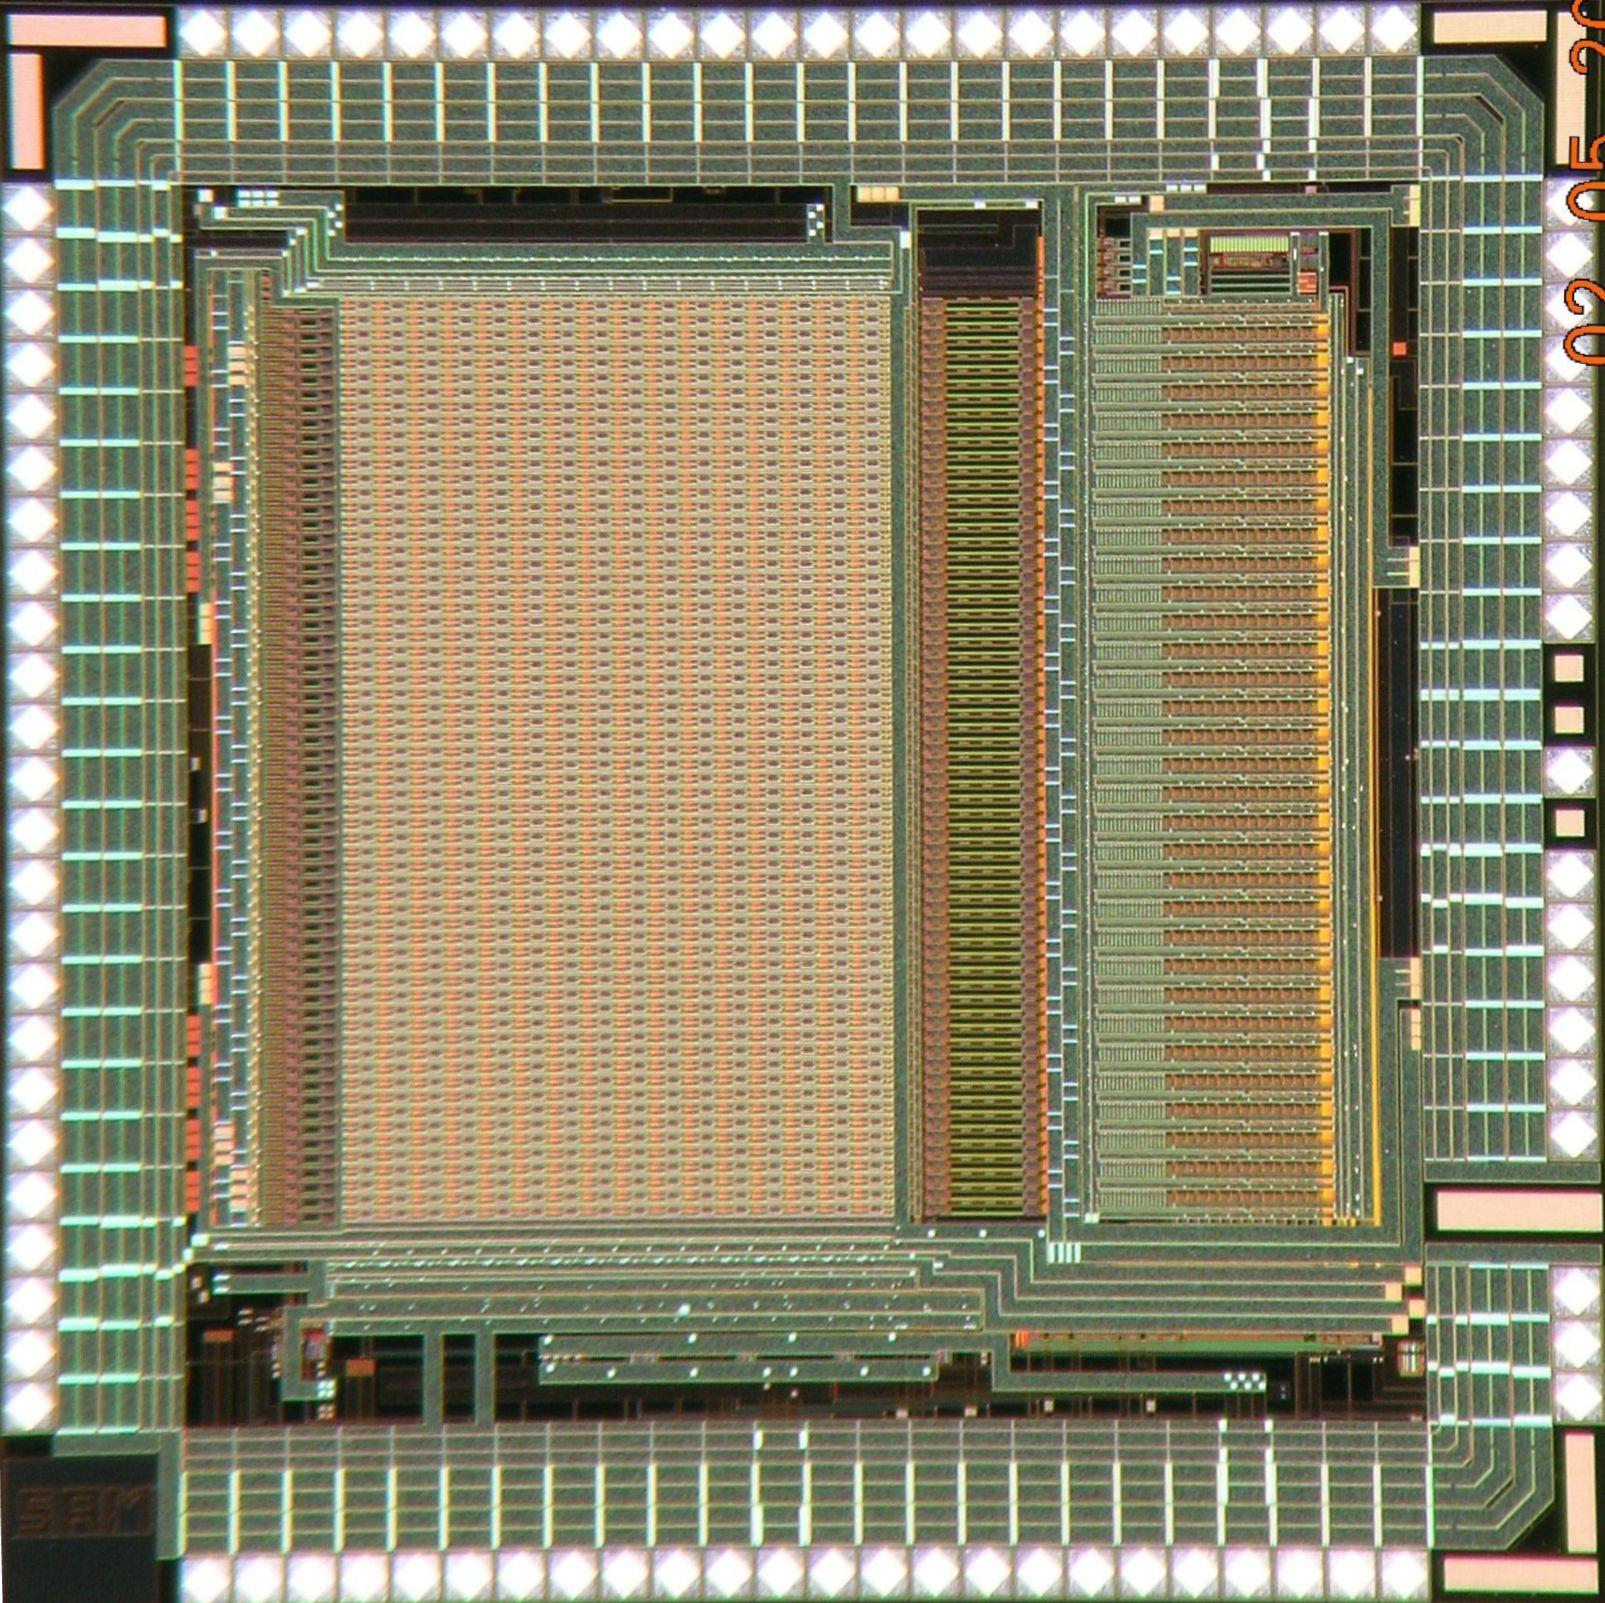 Photographie du circuit SAM